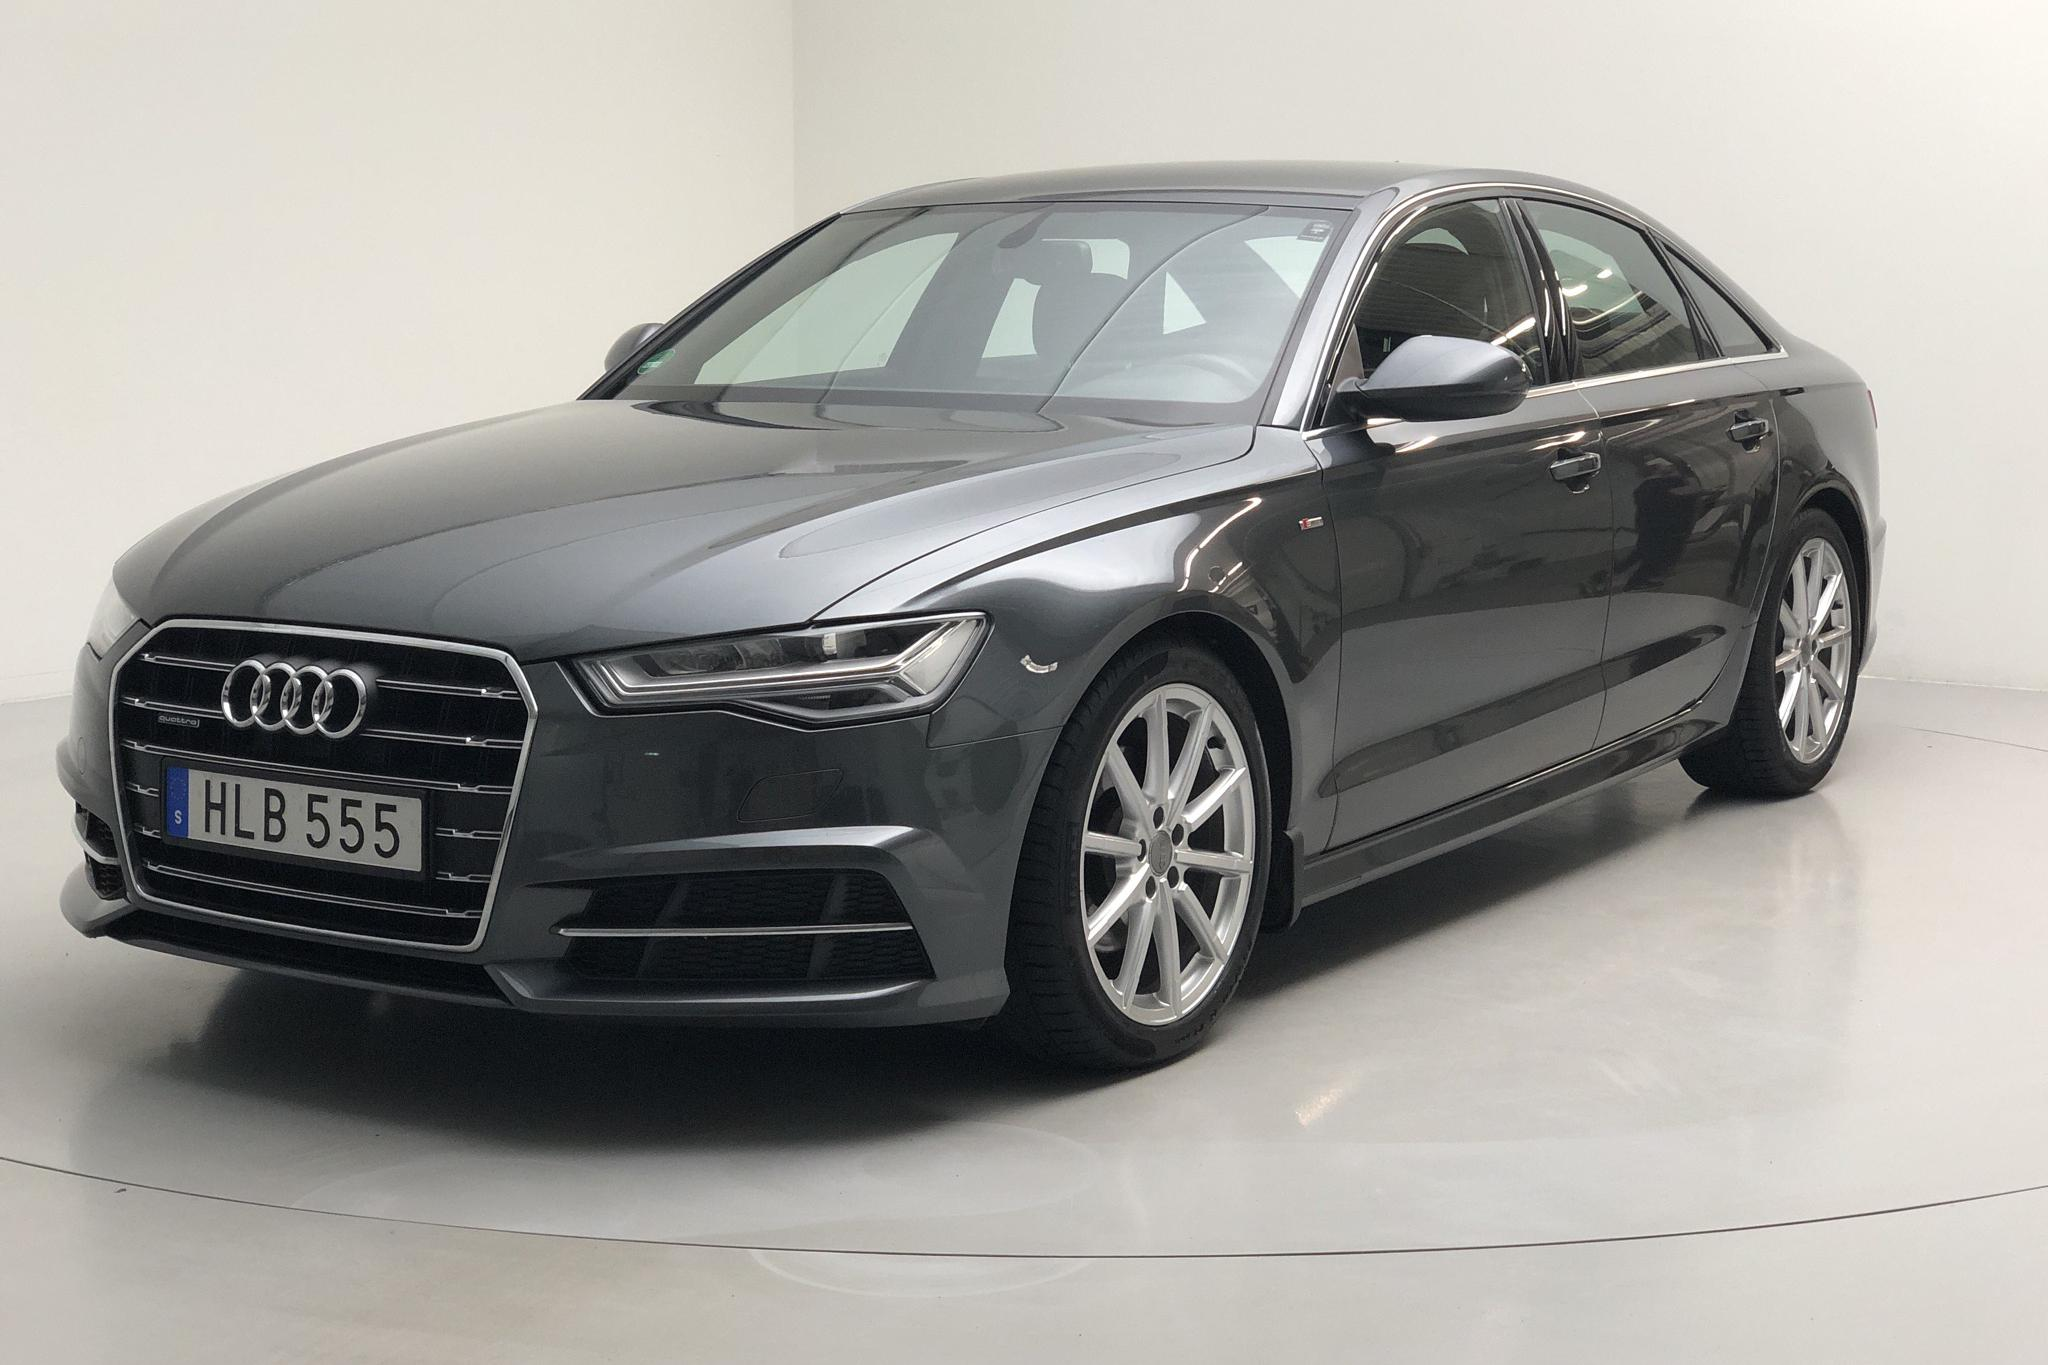 Audi A6 2.0 TDI quattro (190hk)